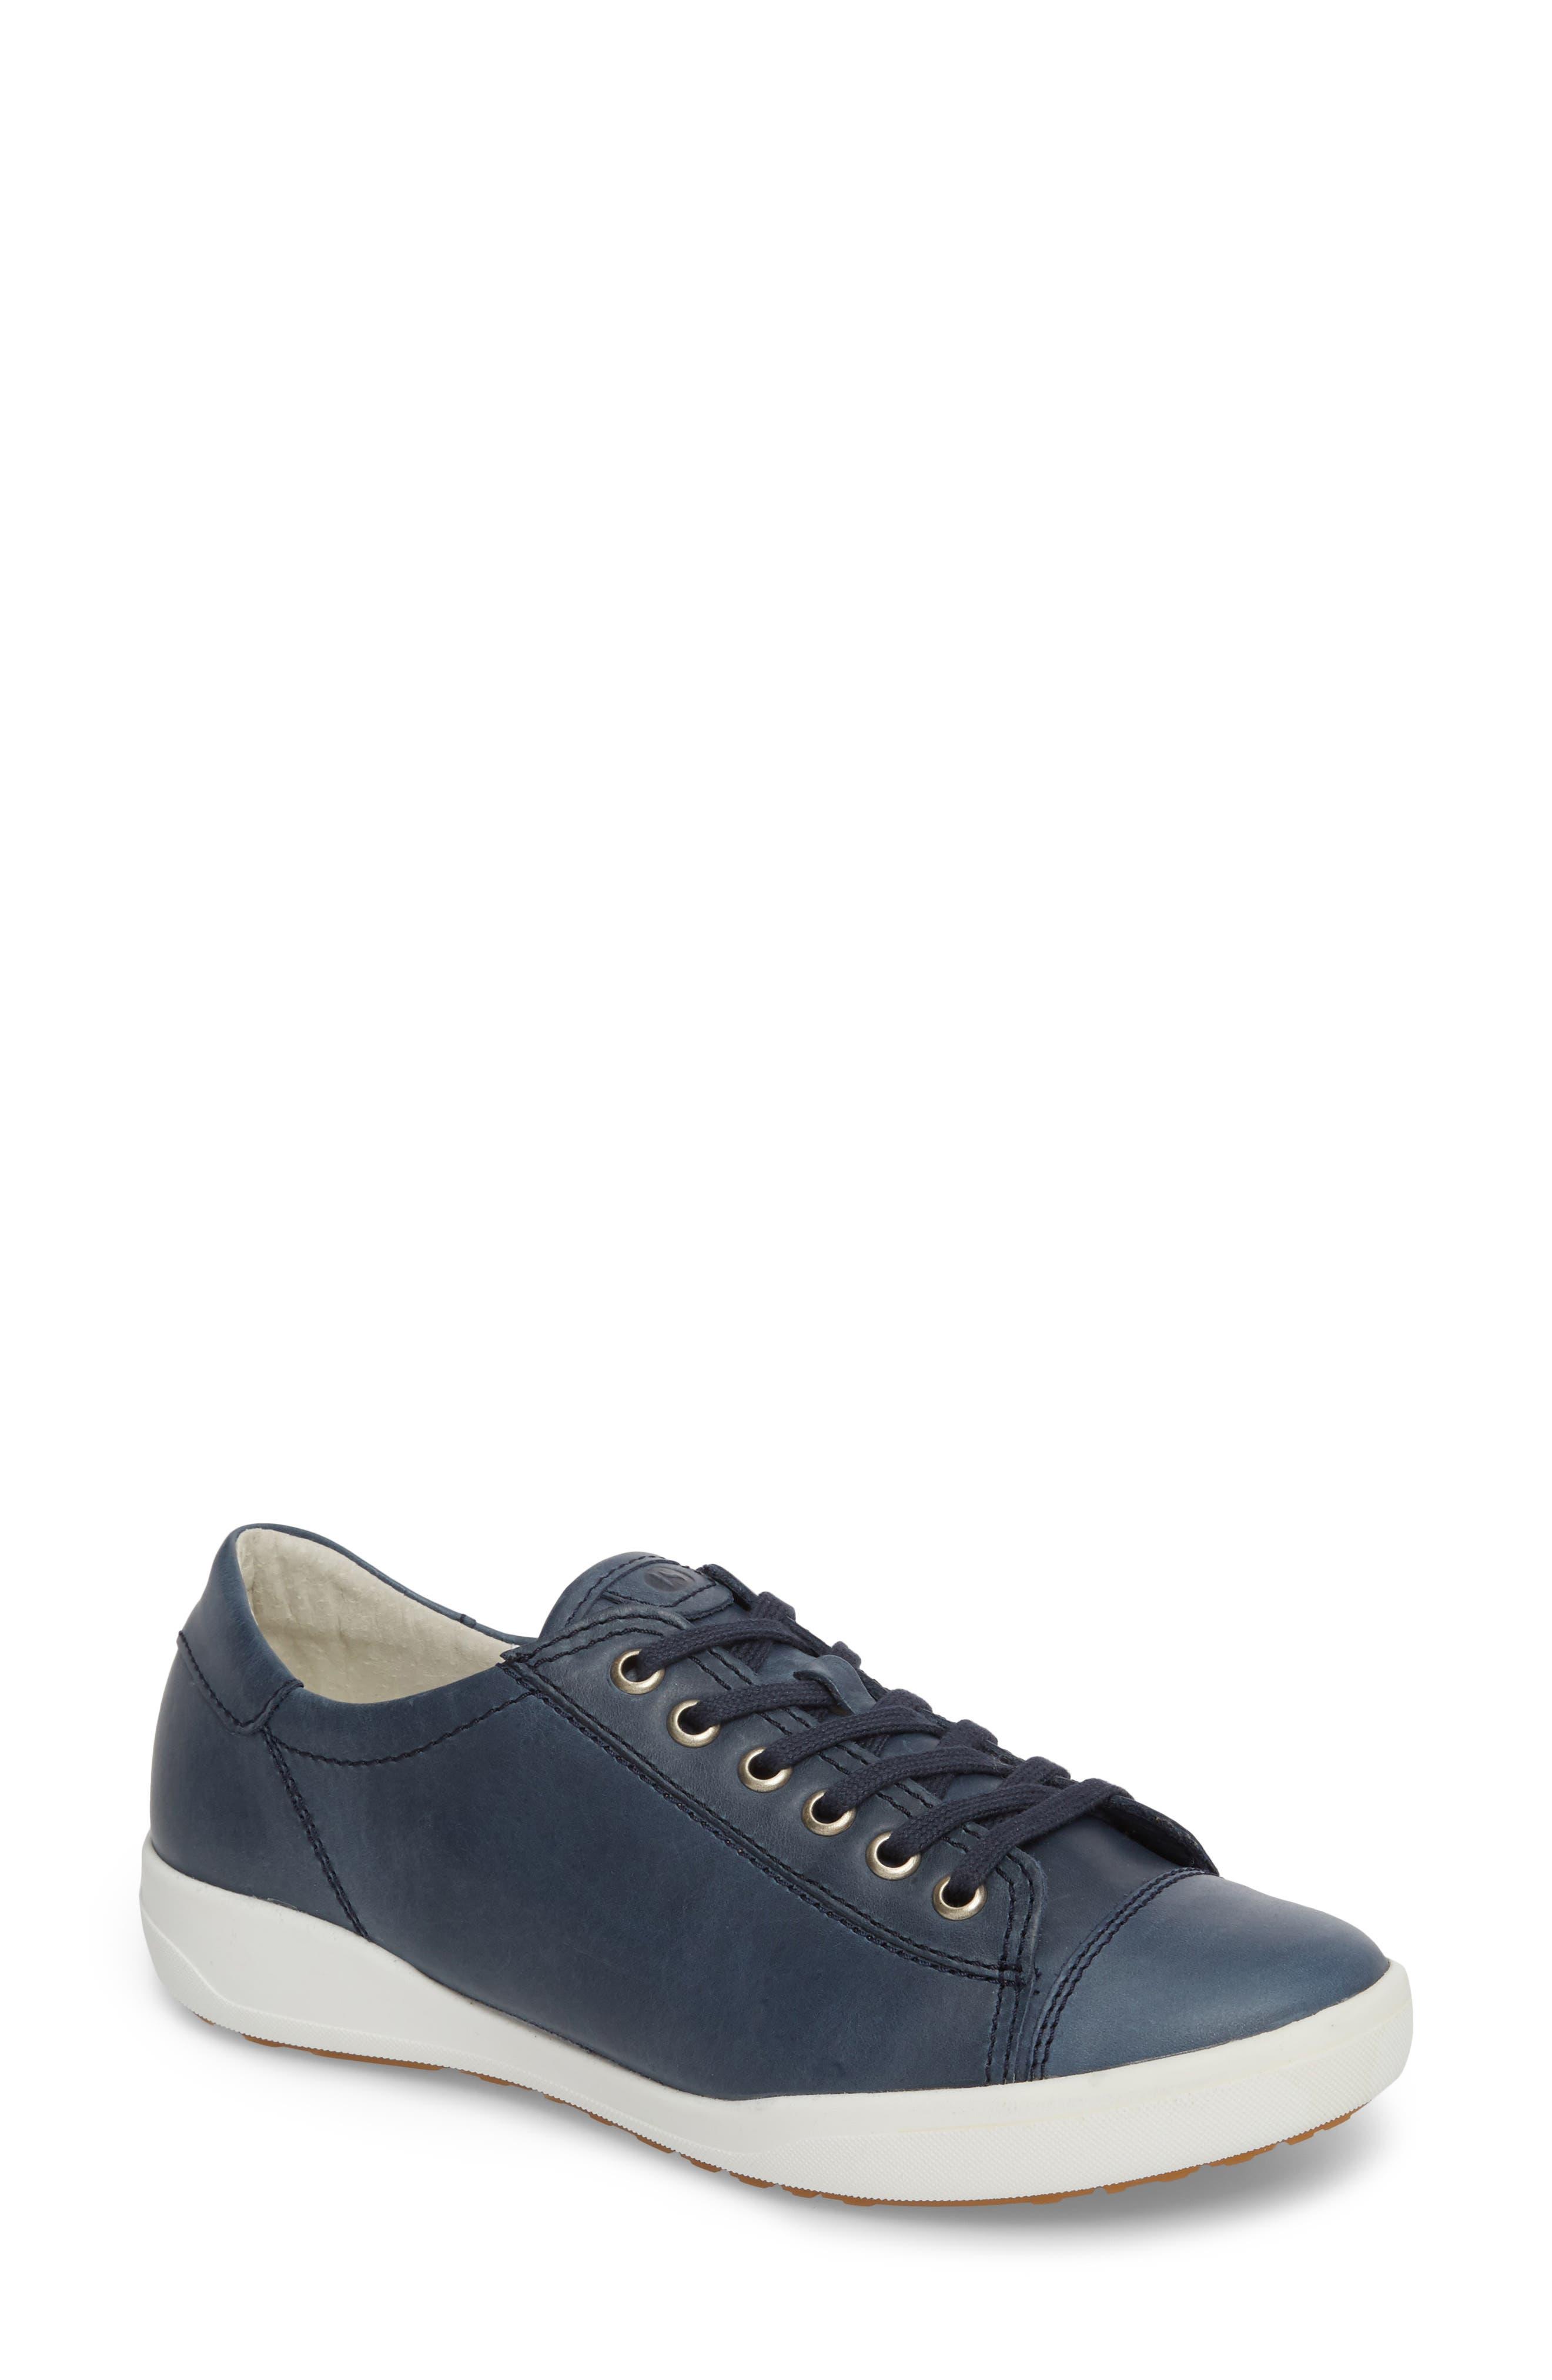 Sina 11 Sneaker,                             Main thumbnail 1, color,                             DENIM LEATHER